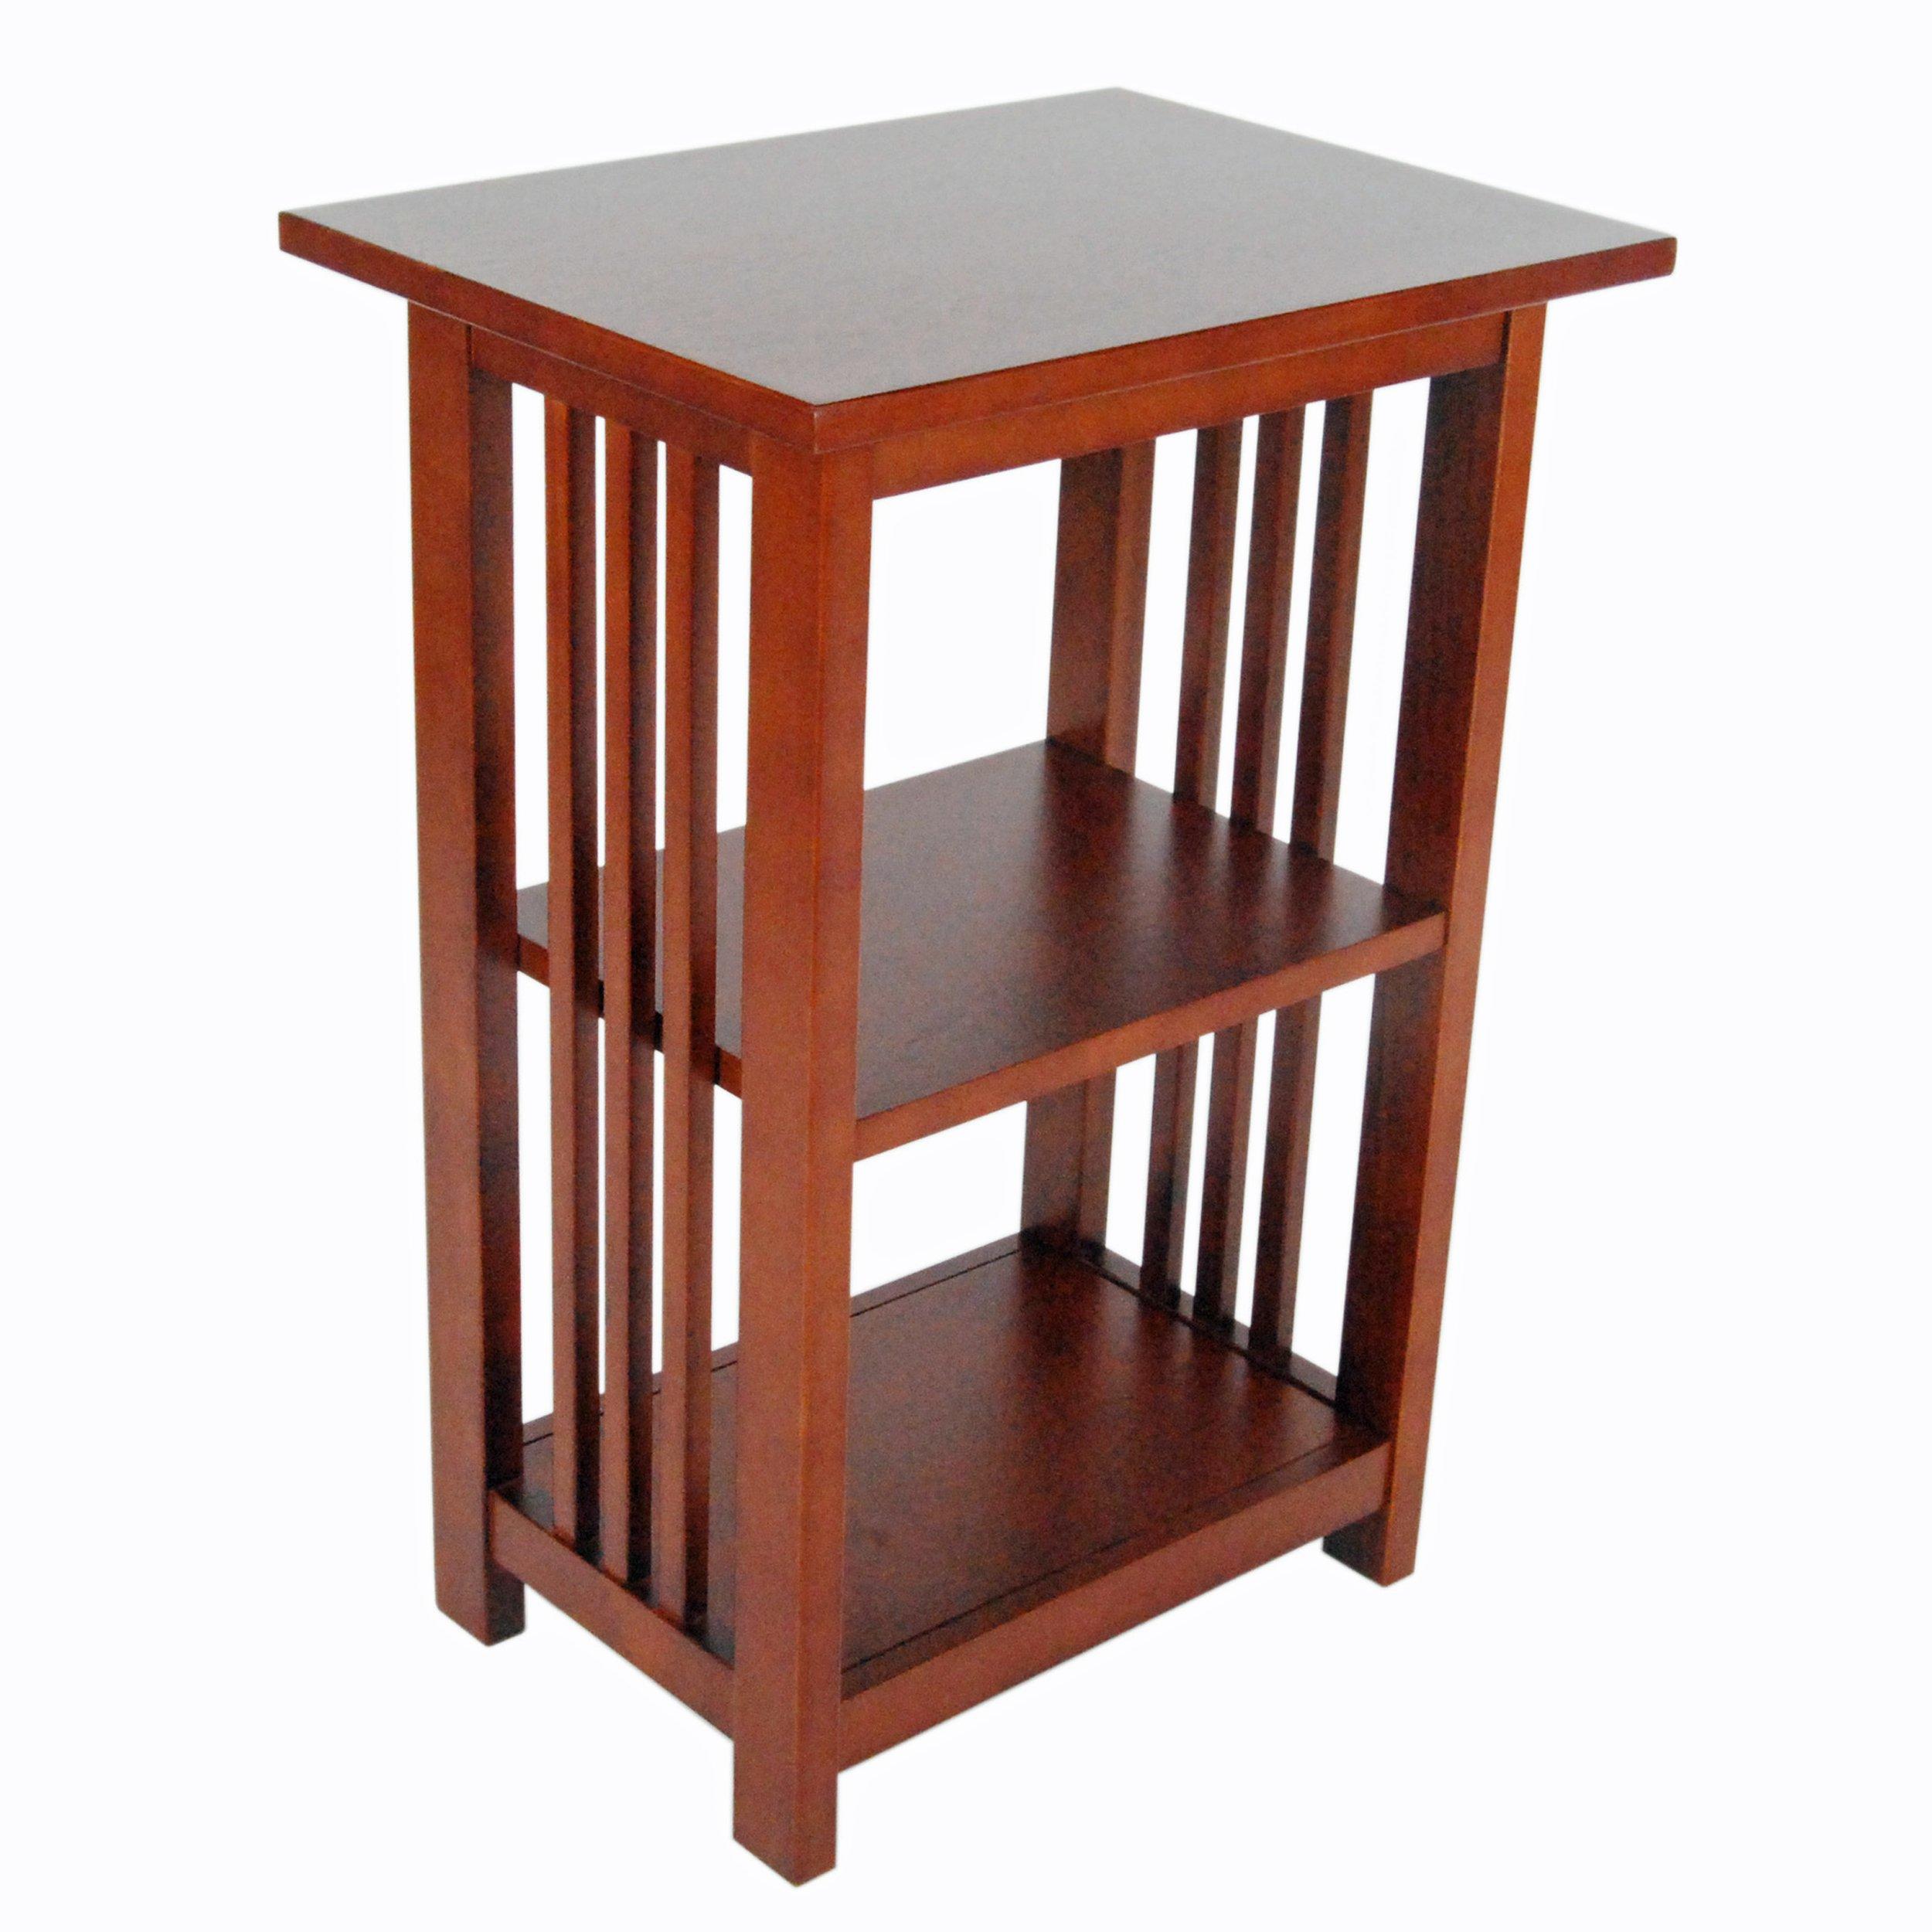 Alaterre Artisan 2-Shelf End Table, Cherry